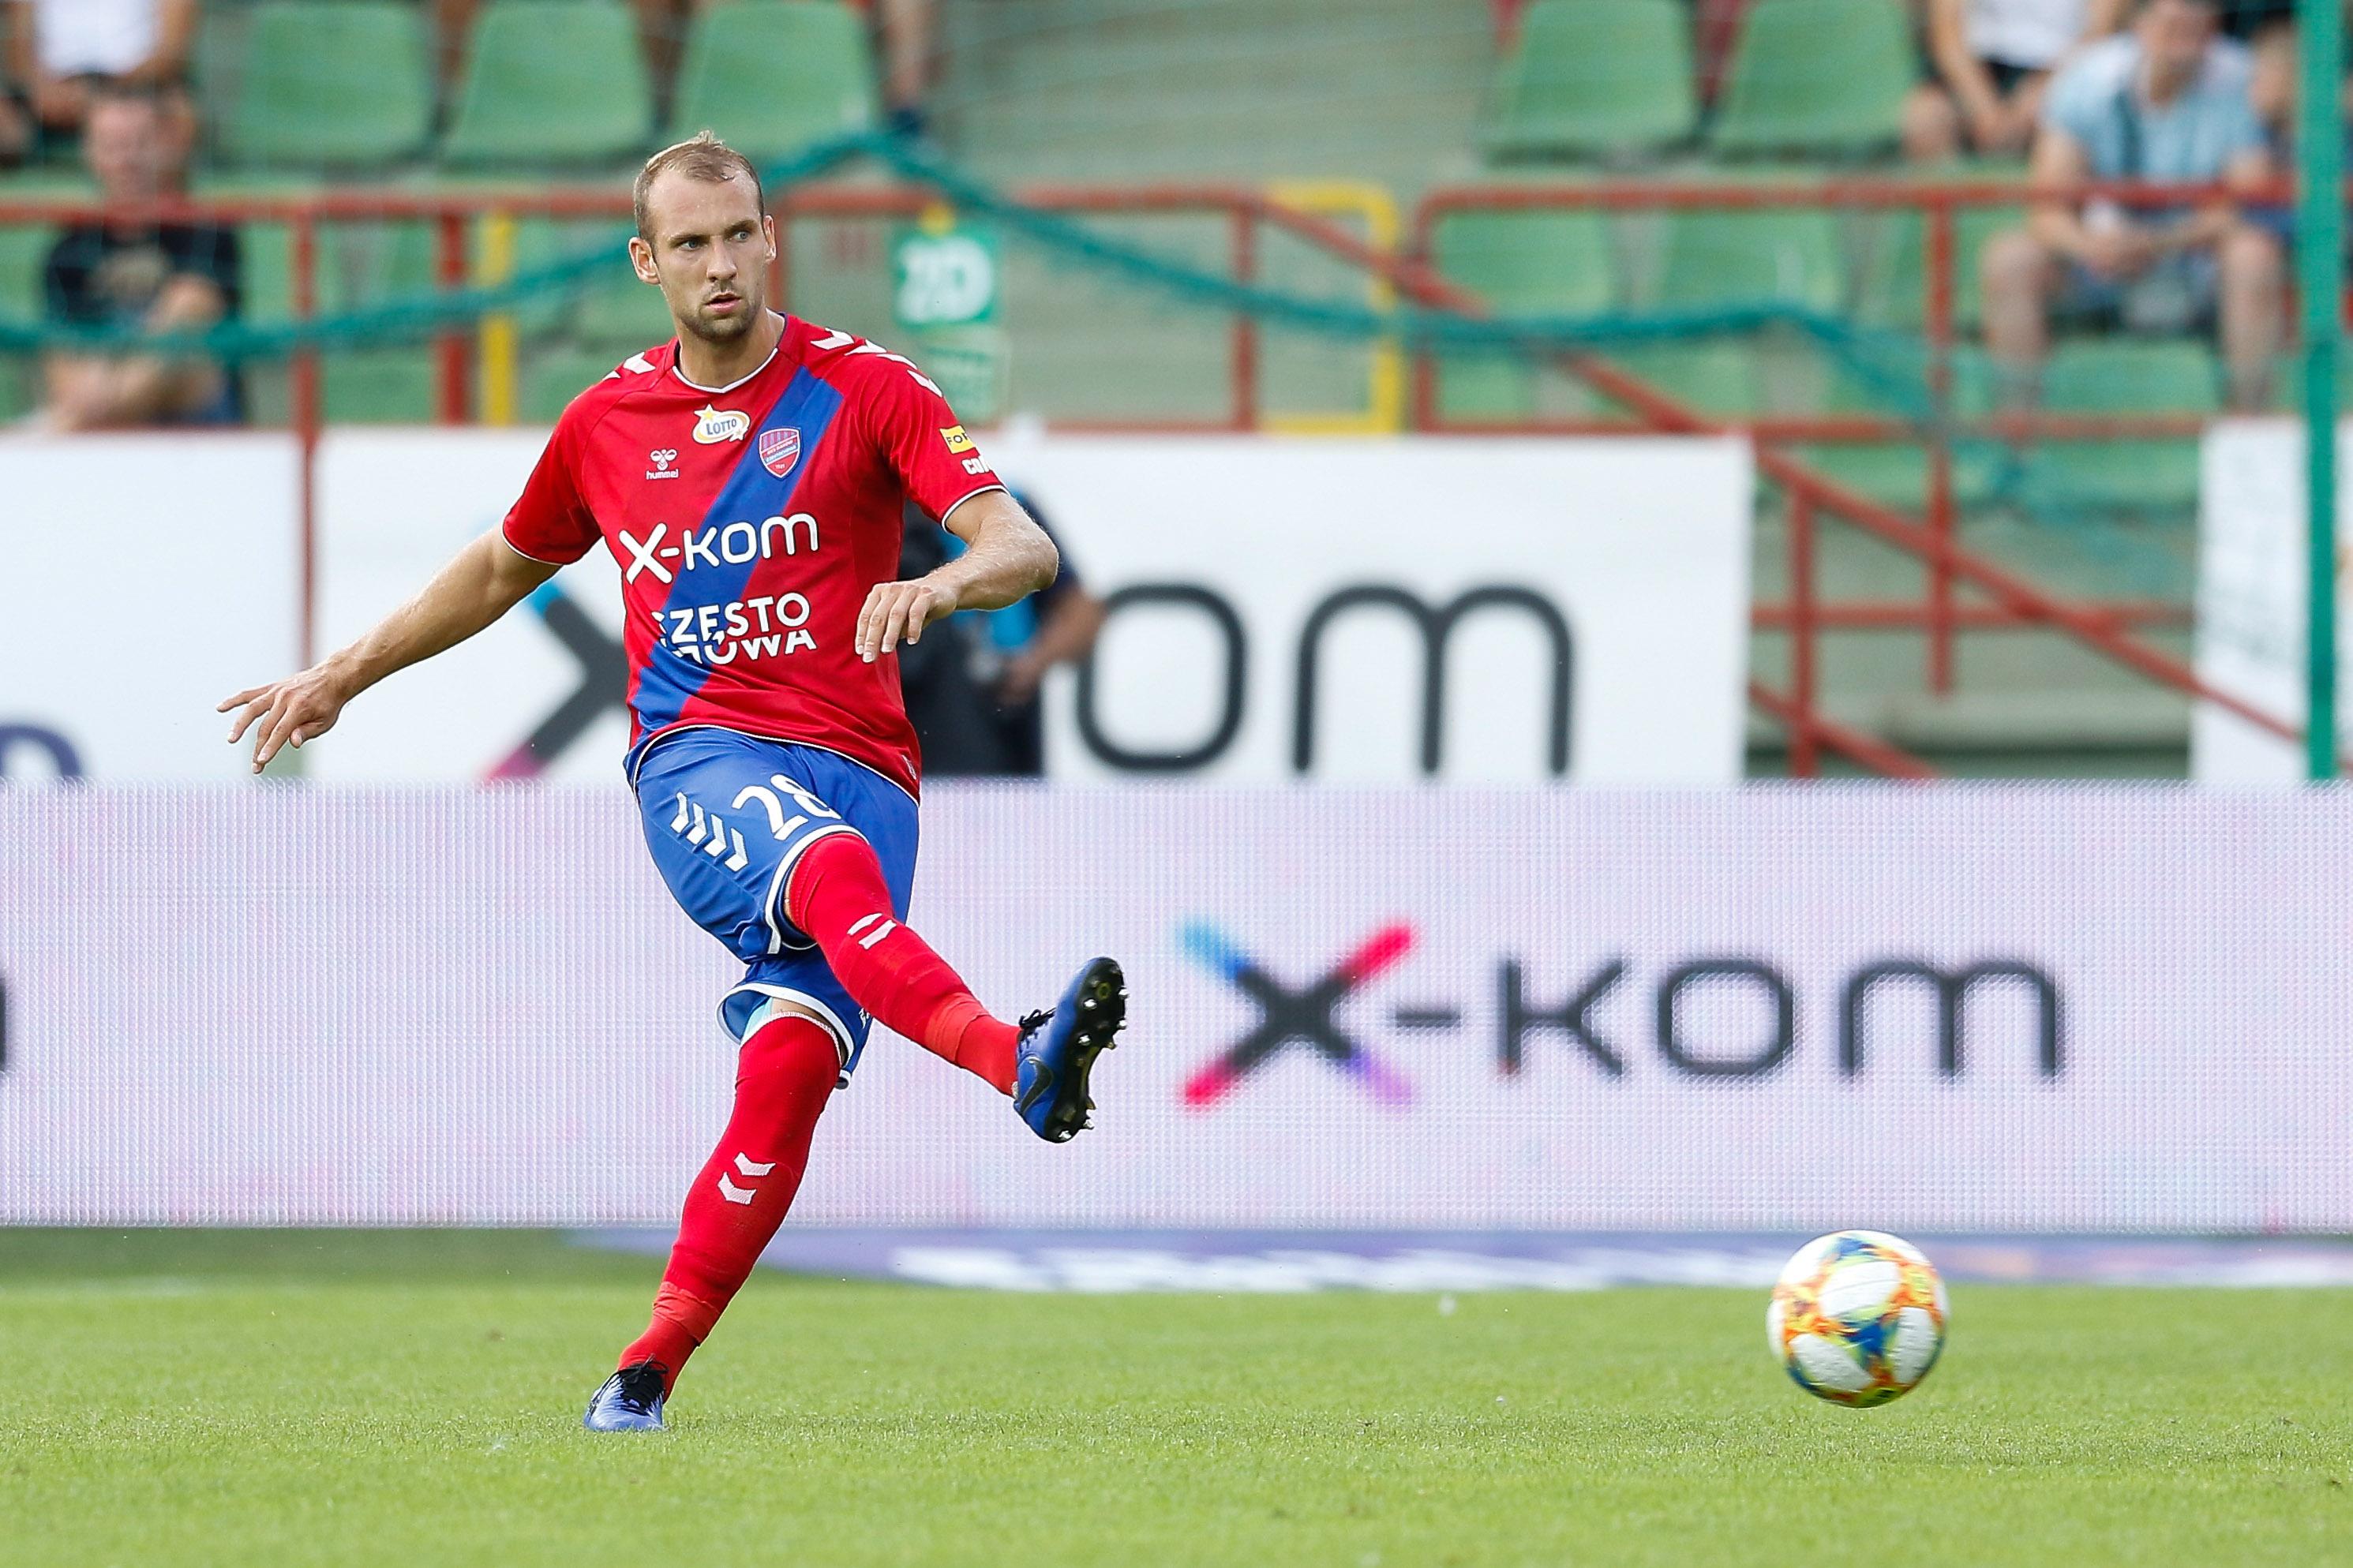 Kasperkiewicz